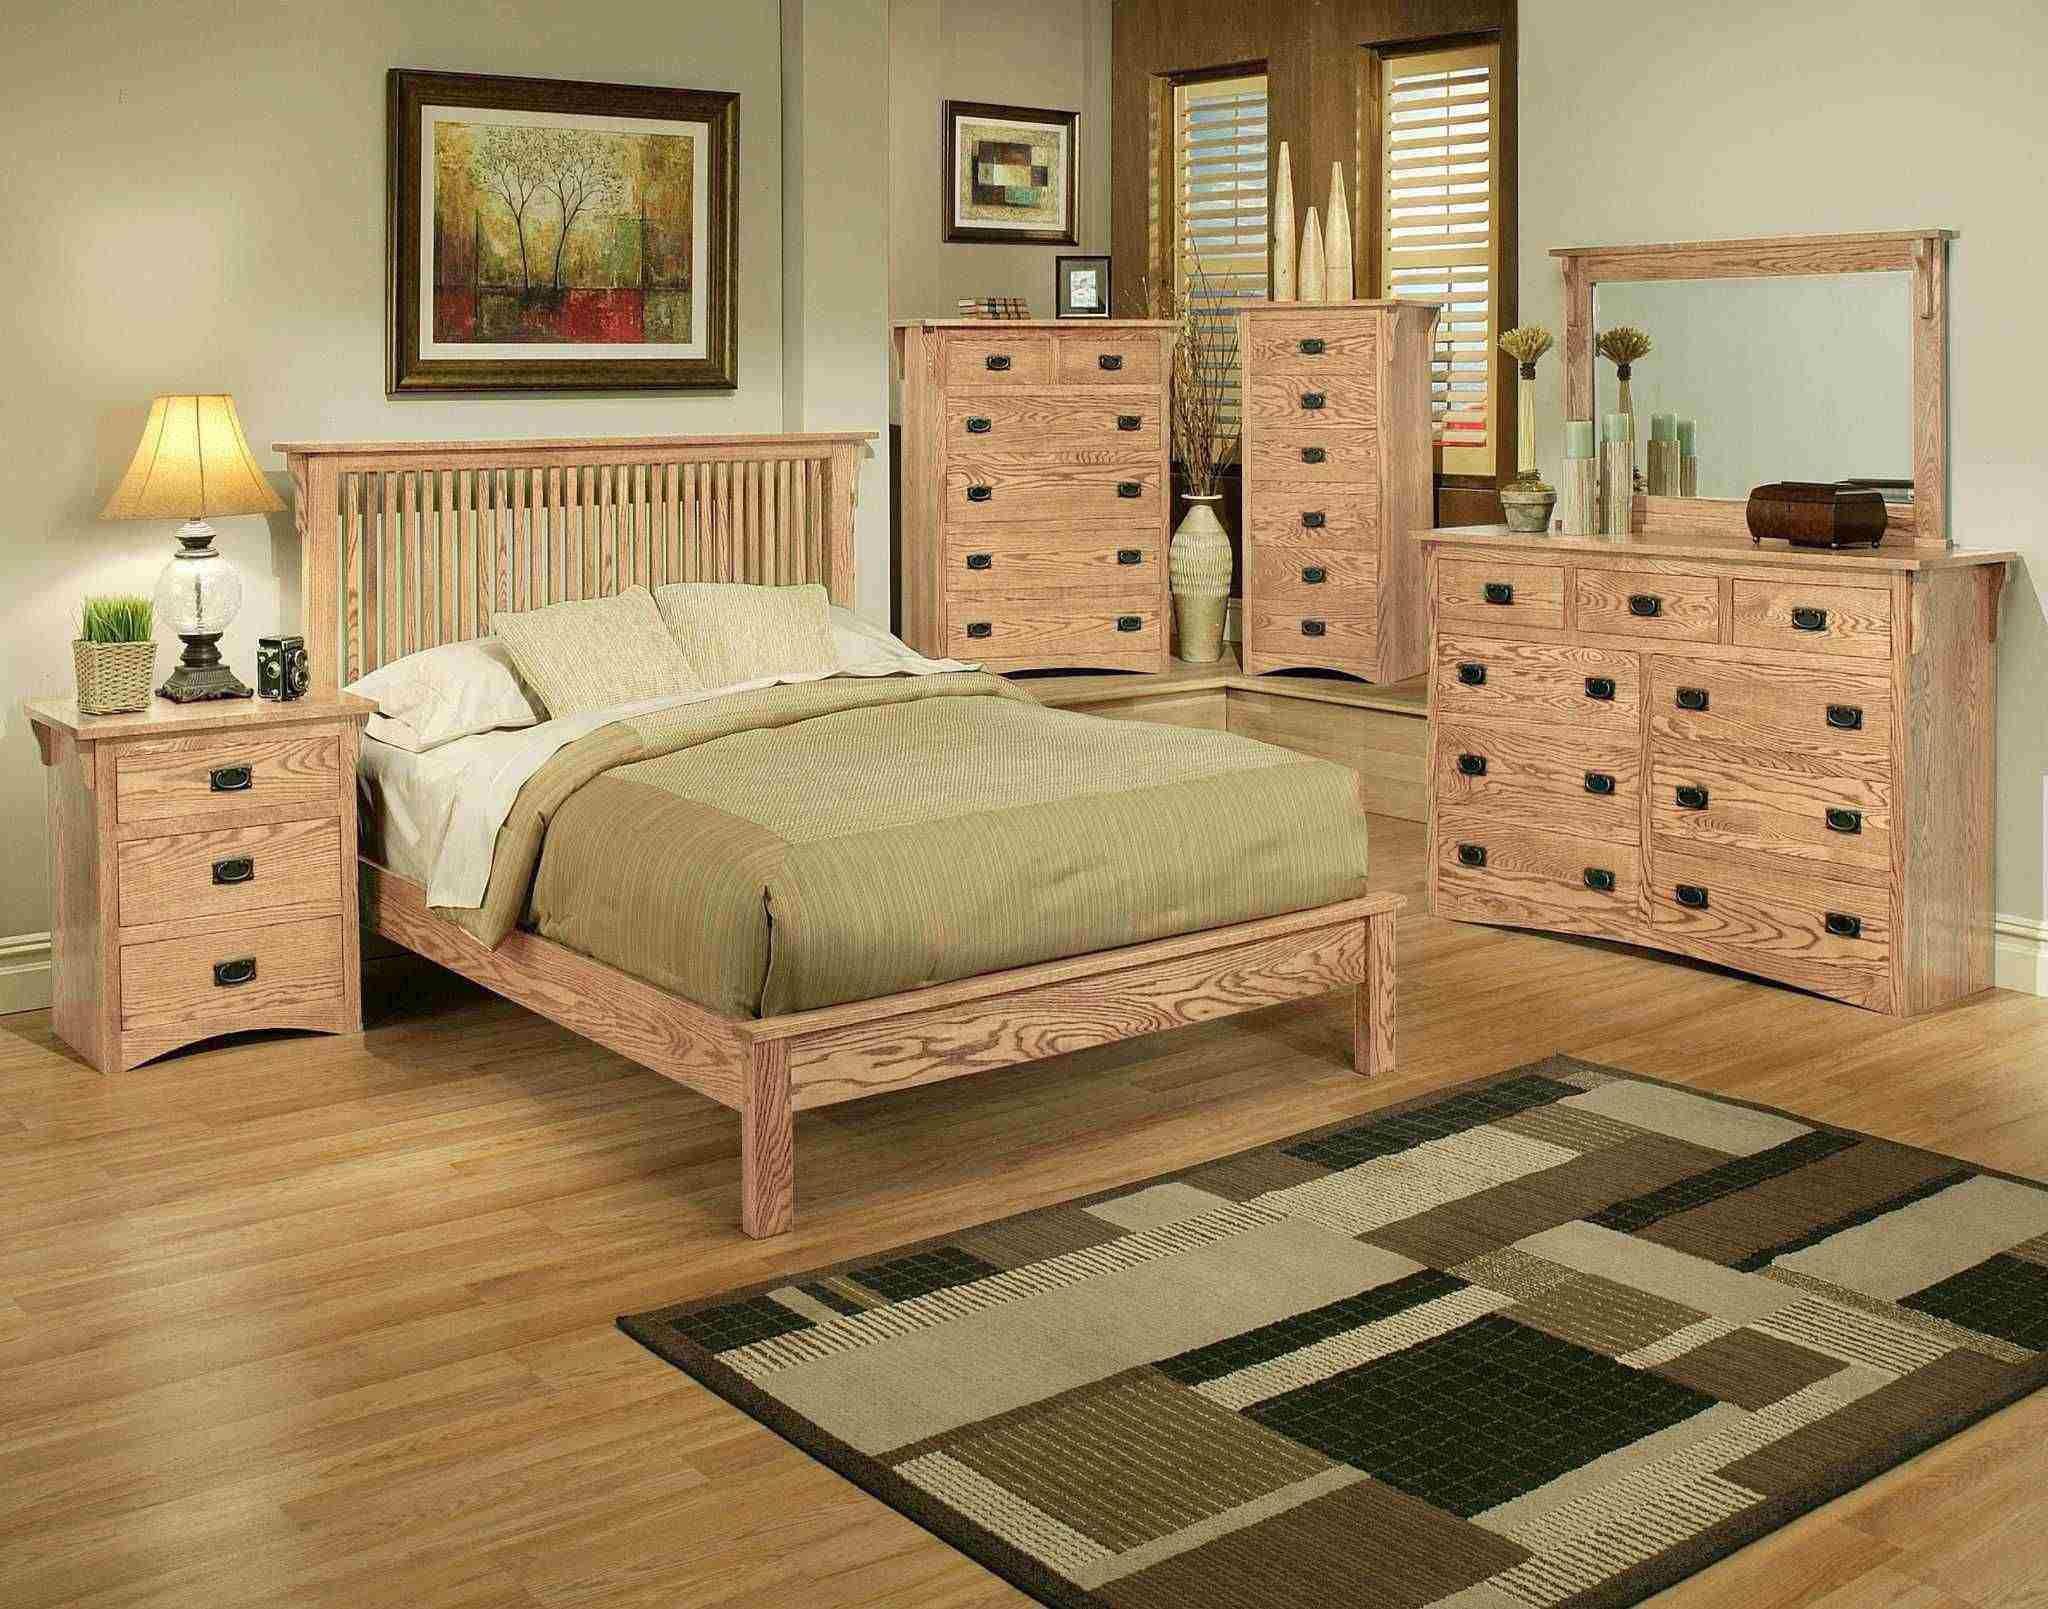 Mission Bedroom Furniture di 2020